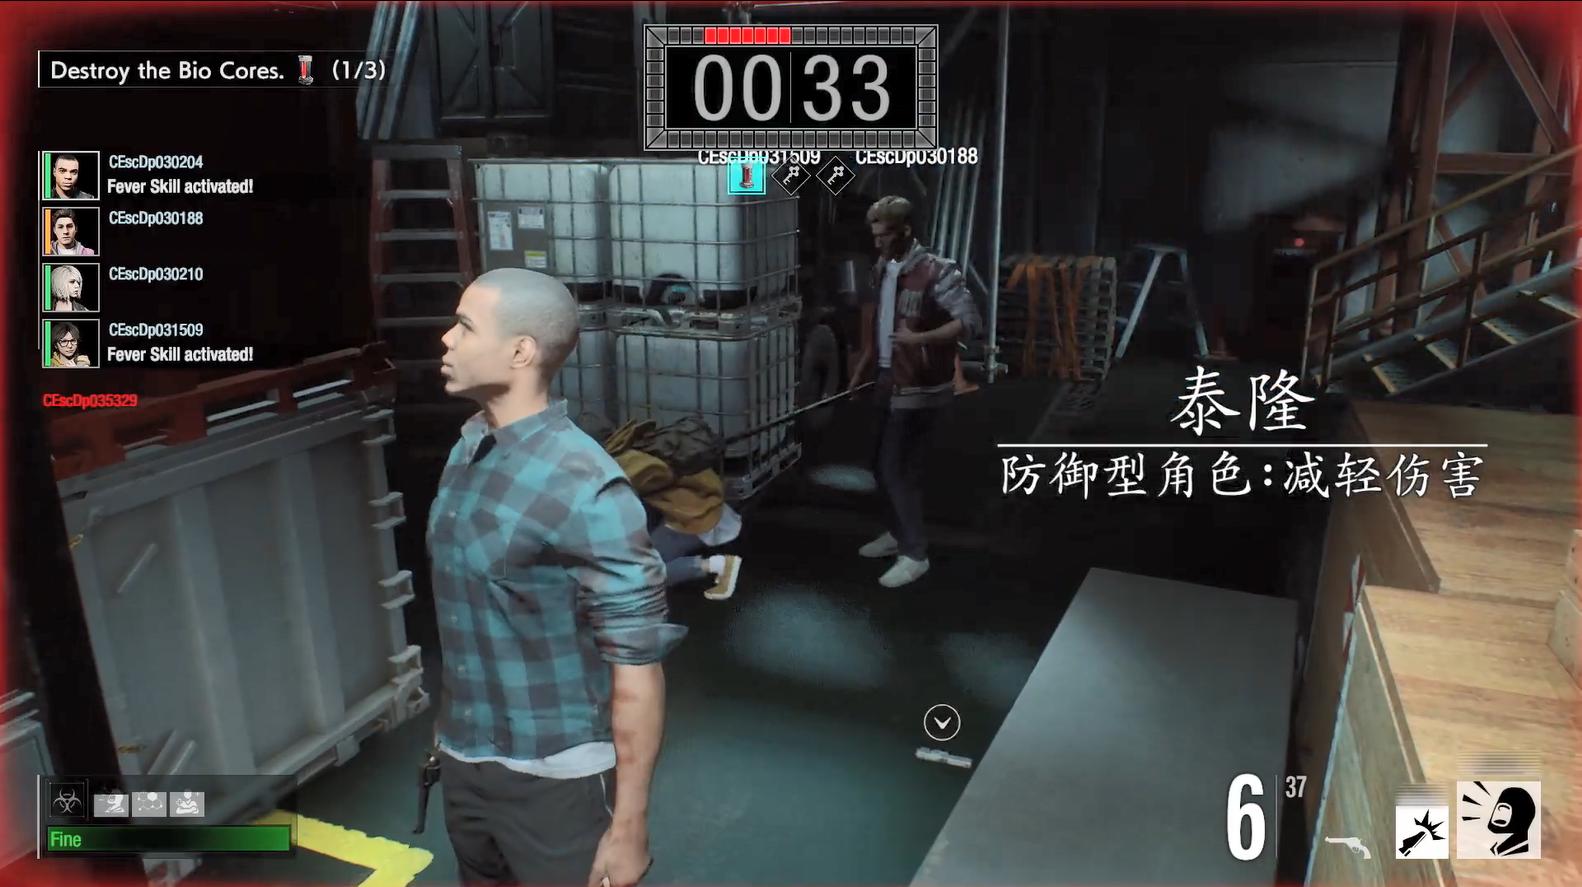 TGS:《生化危机》新作实机玩法视频首曝!非对称PVP玩法